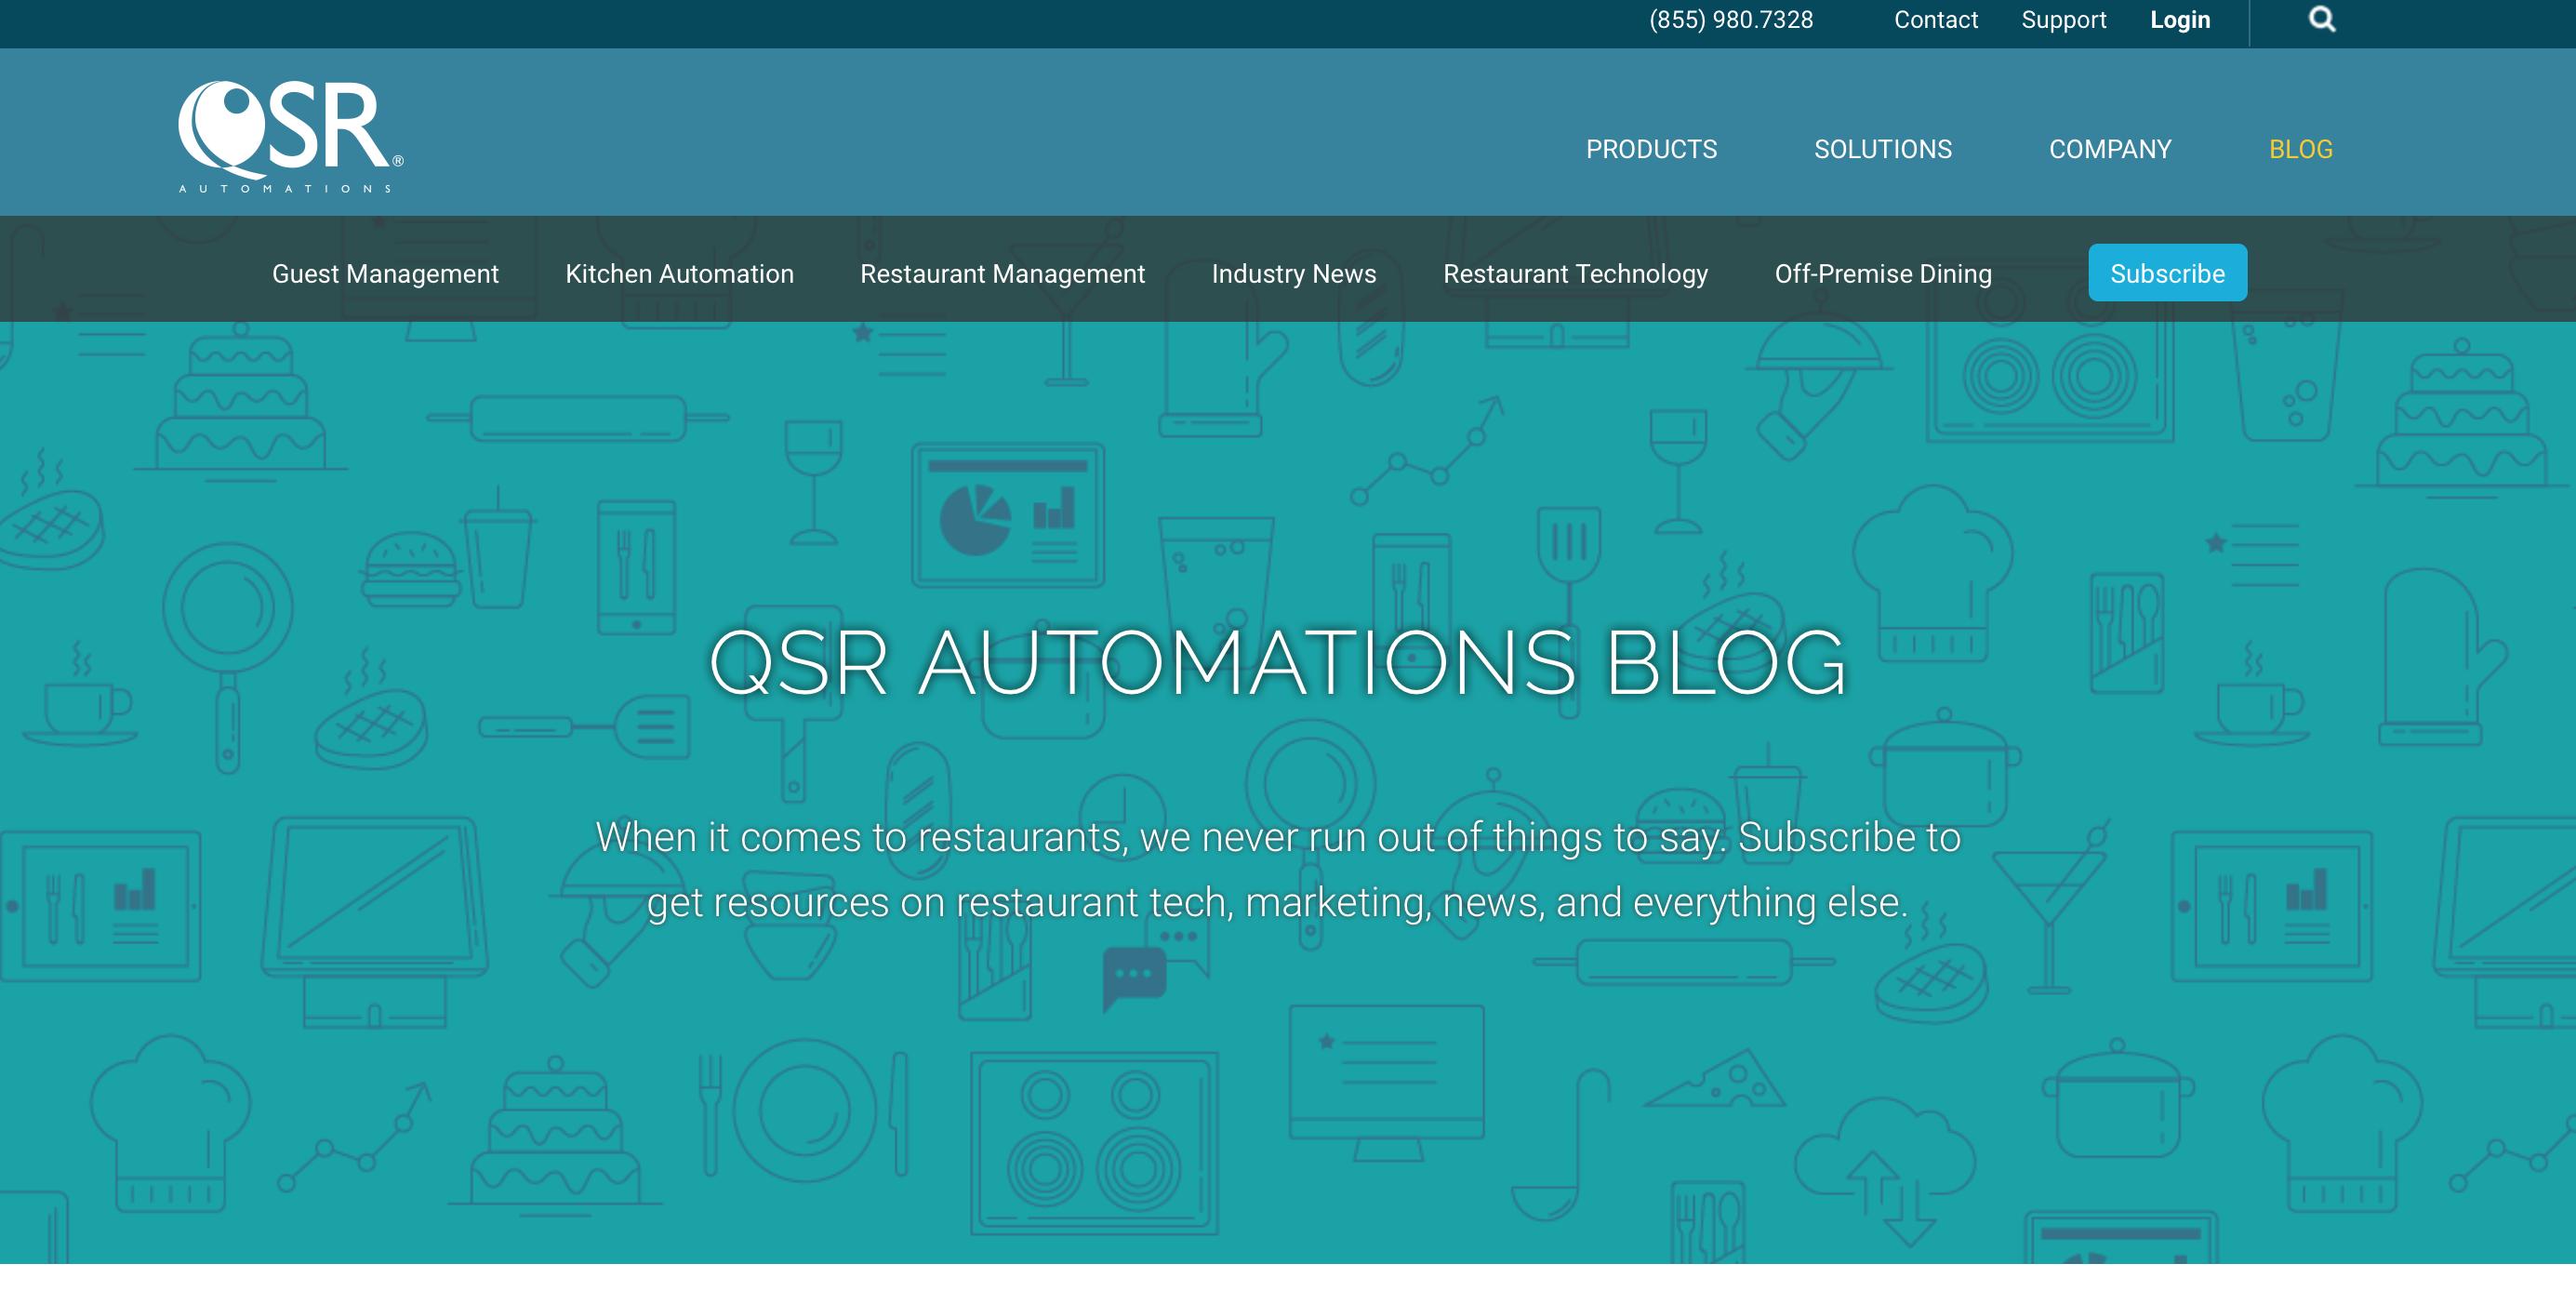 QSR Automations Blog  image